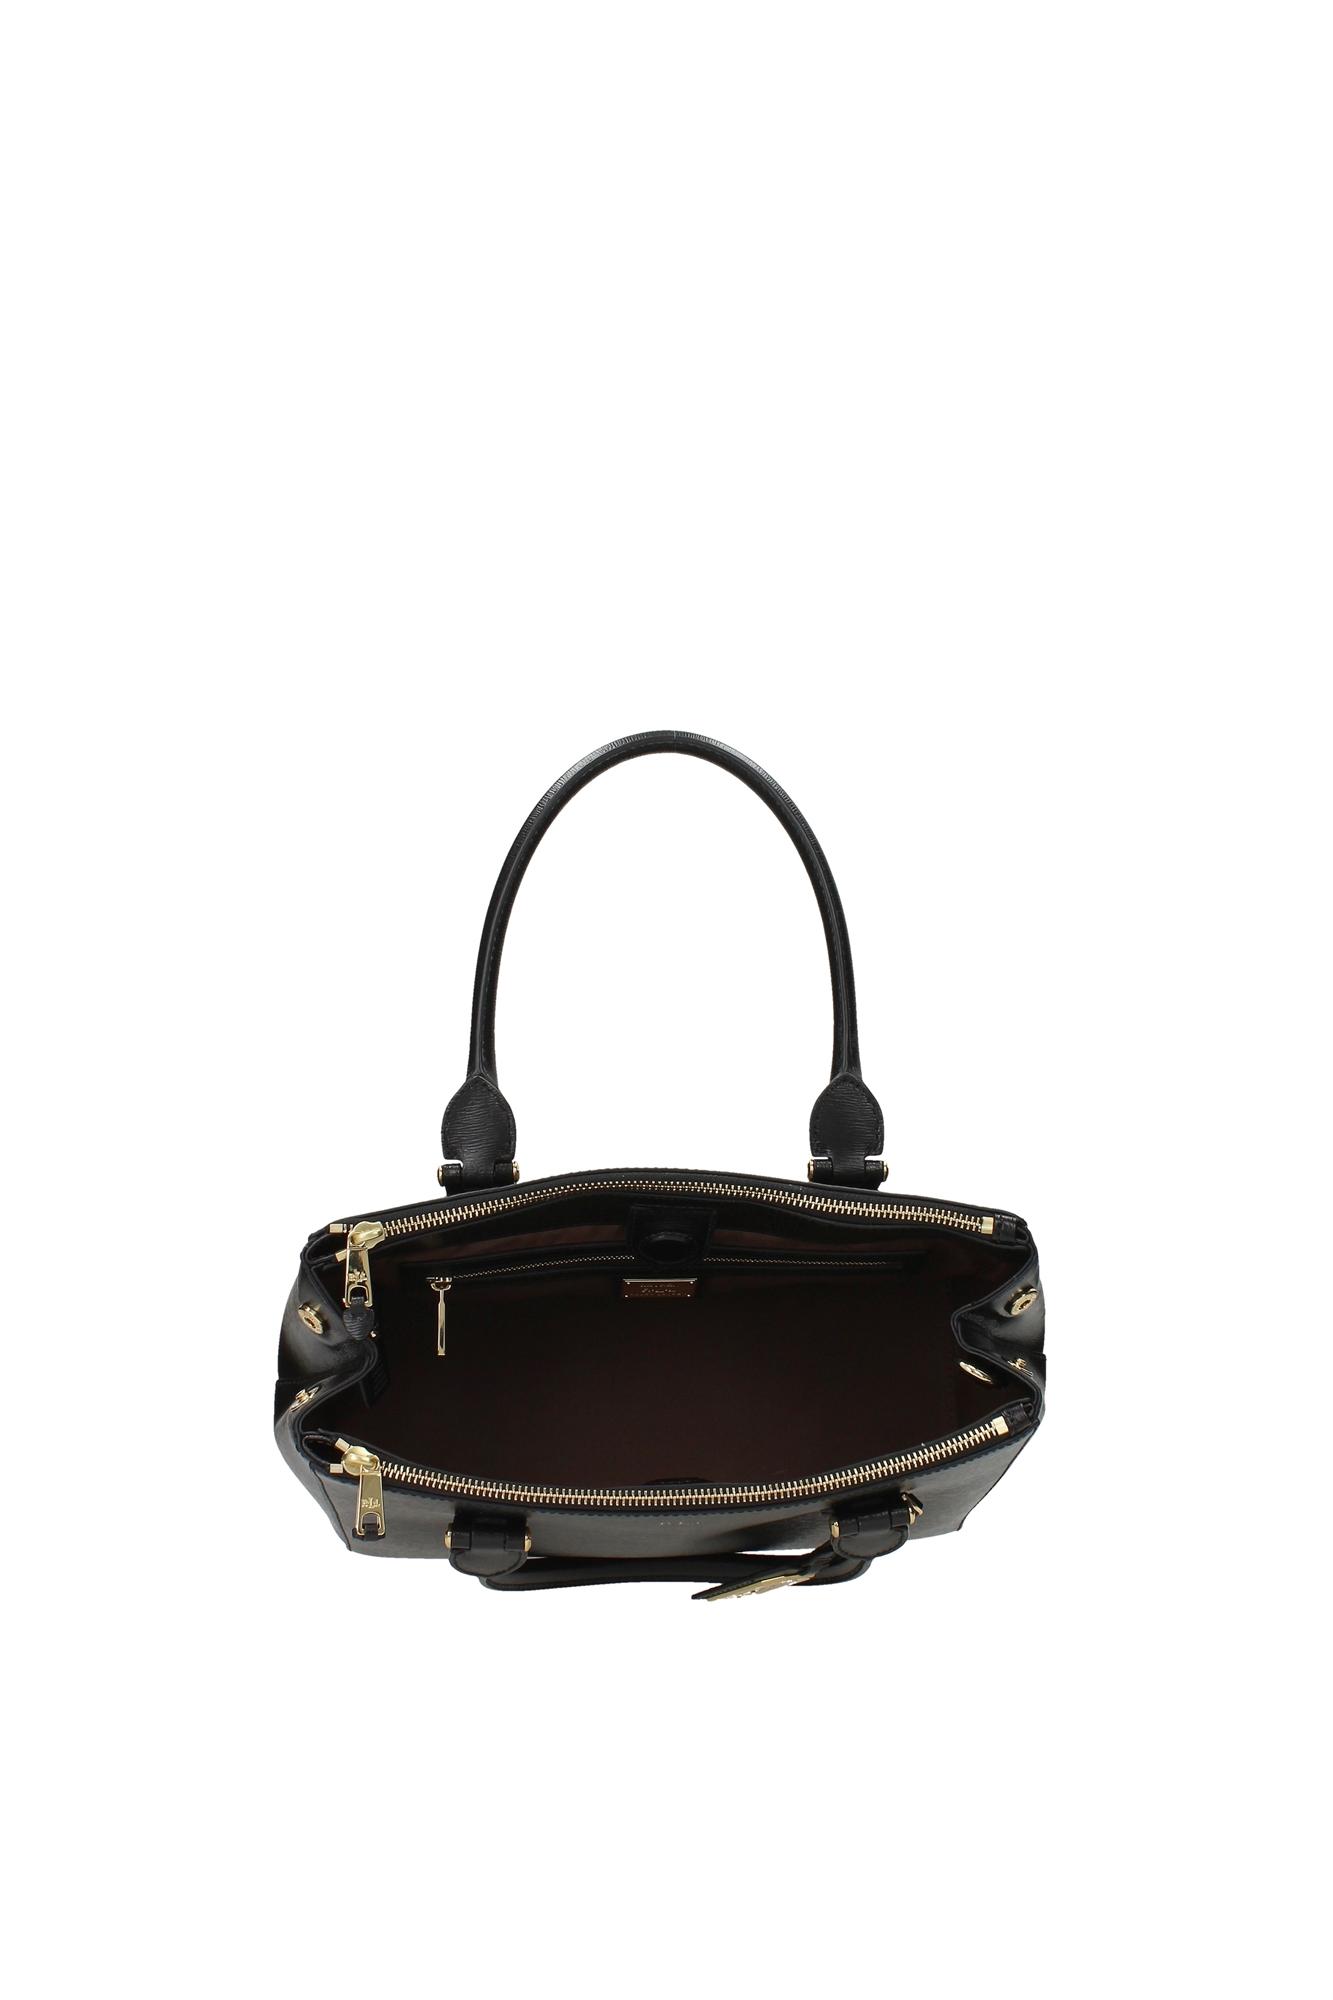 handtasche ralph lauren damen leder schwarz n91lndzsr2sc1vola7 ebay. Black Bedroom Furniture Sets. Home Design Ideas